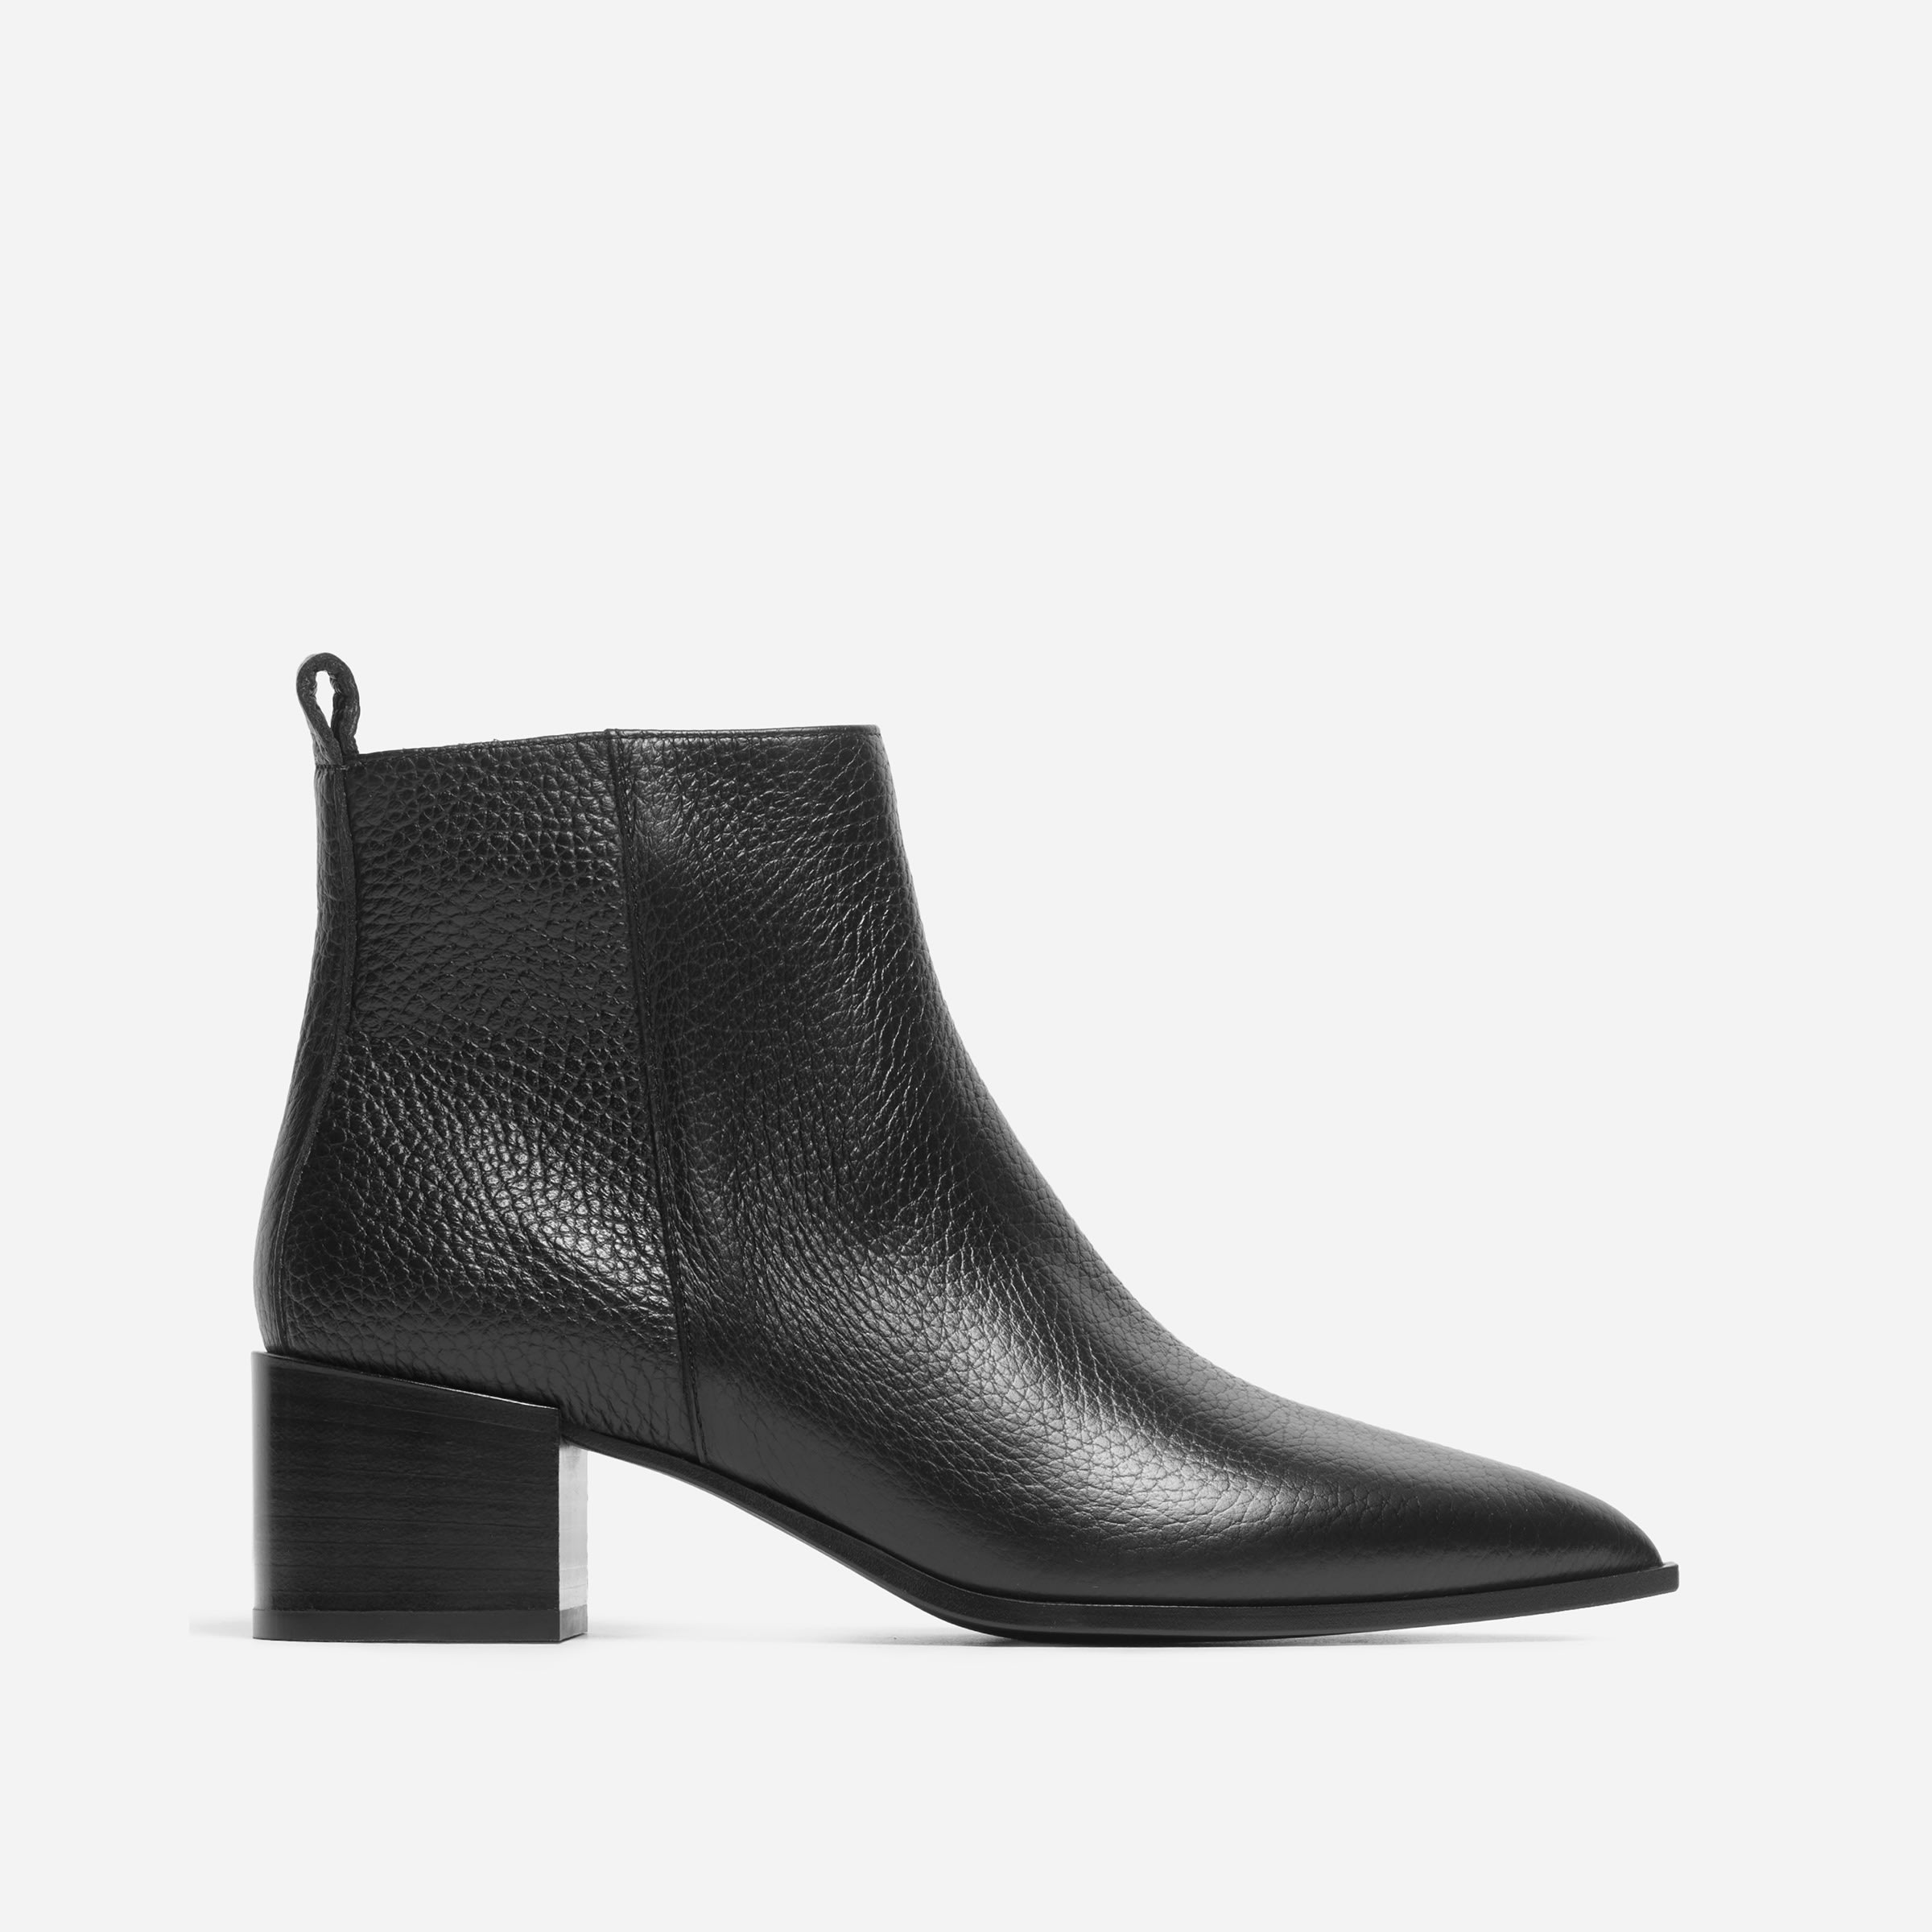 Everlane boots